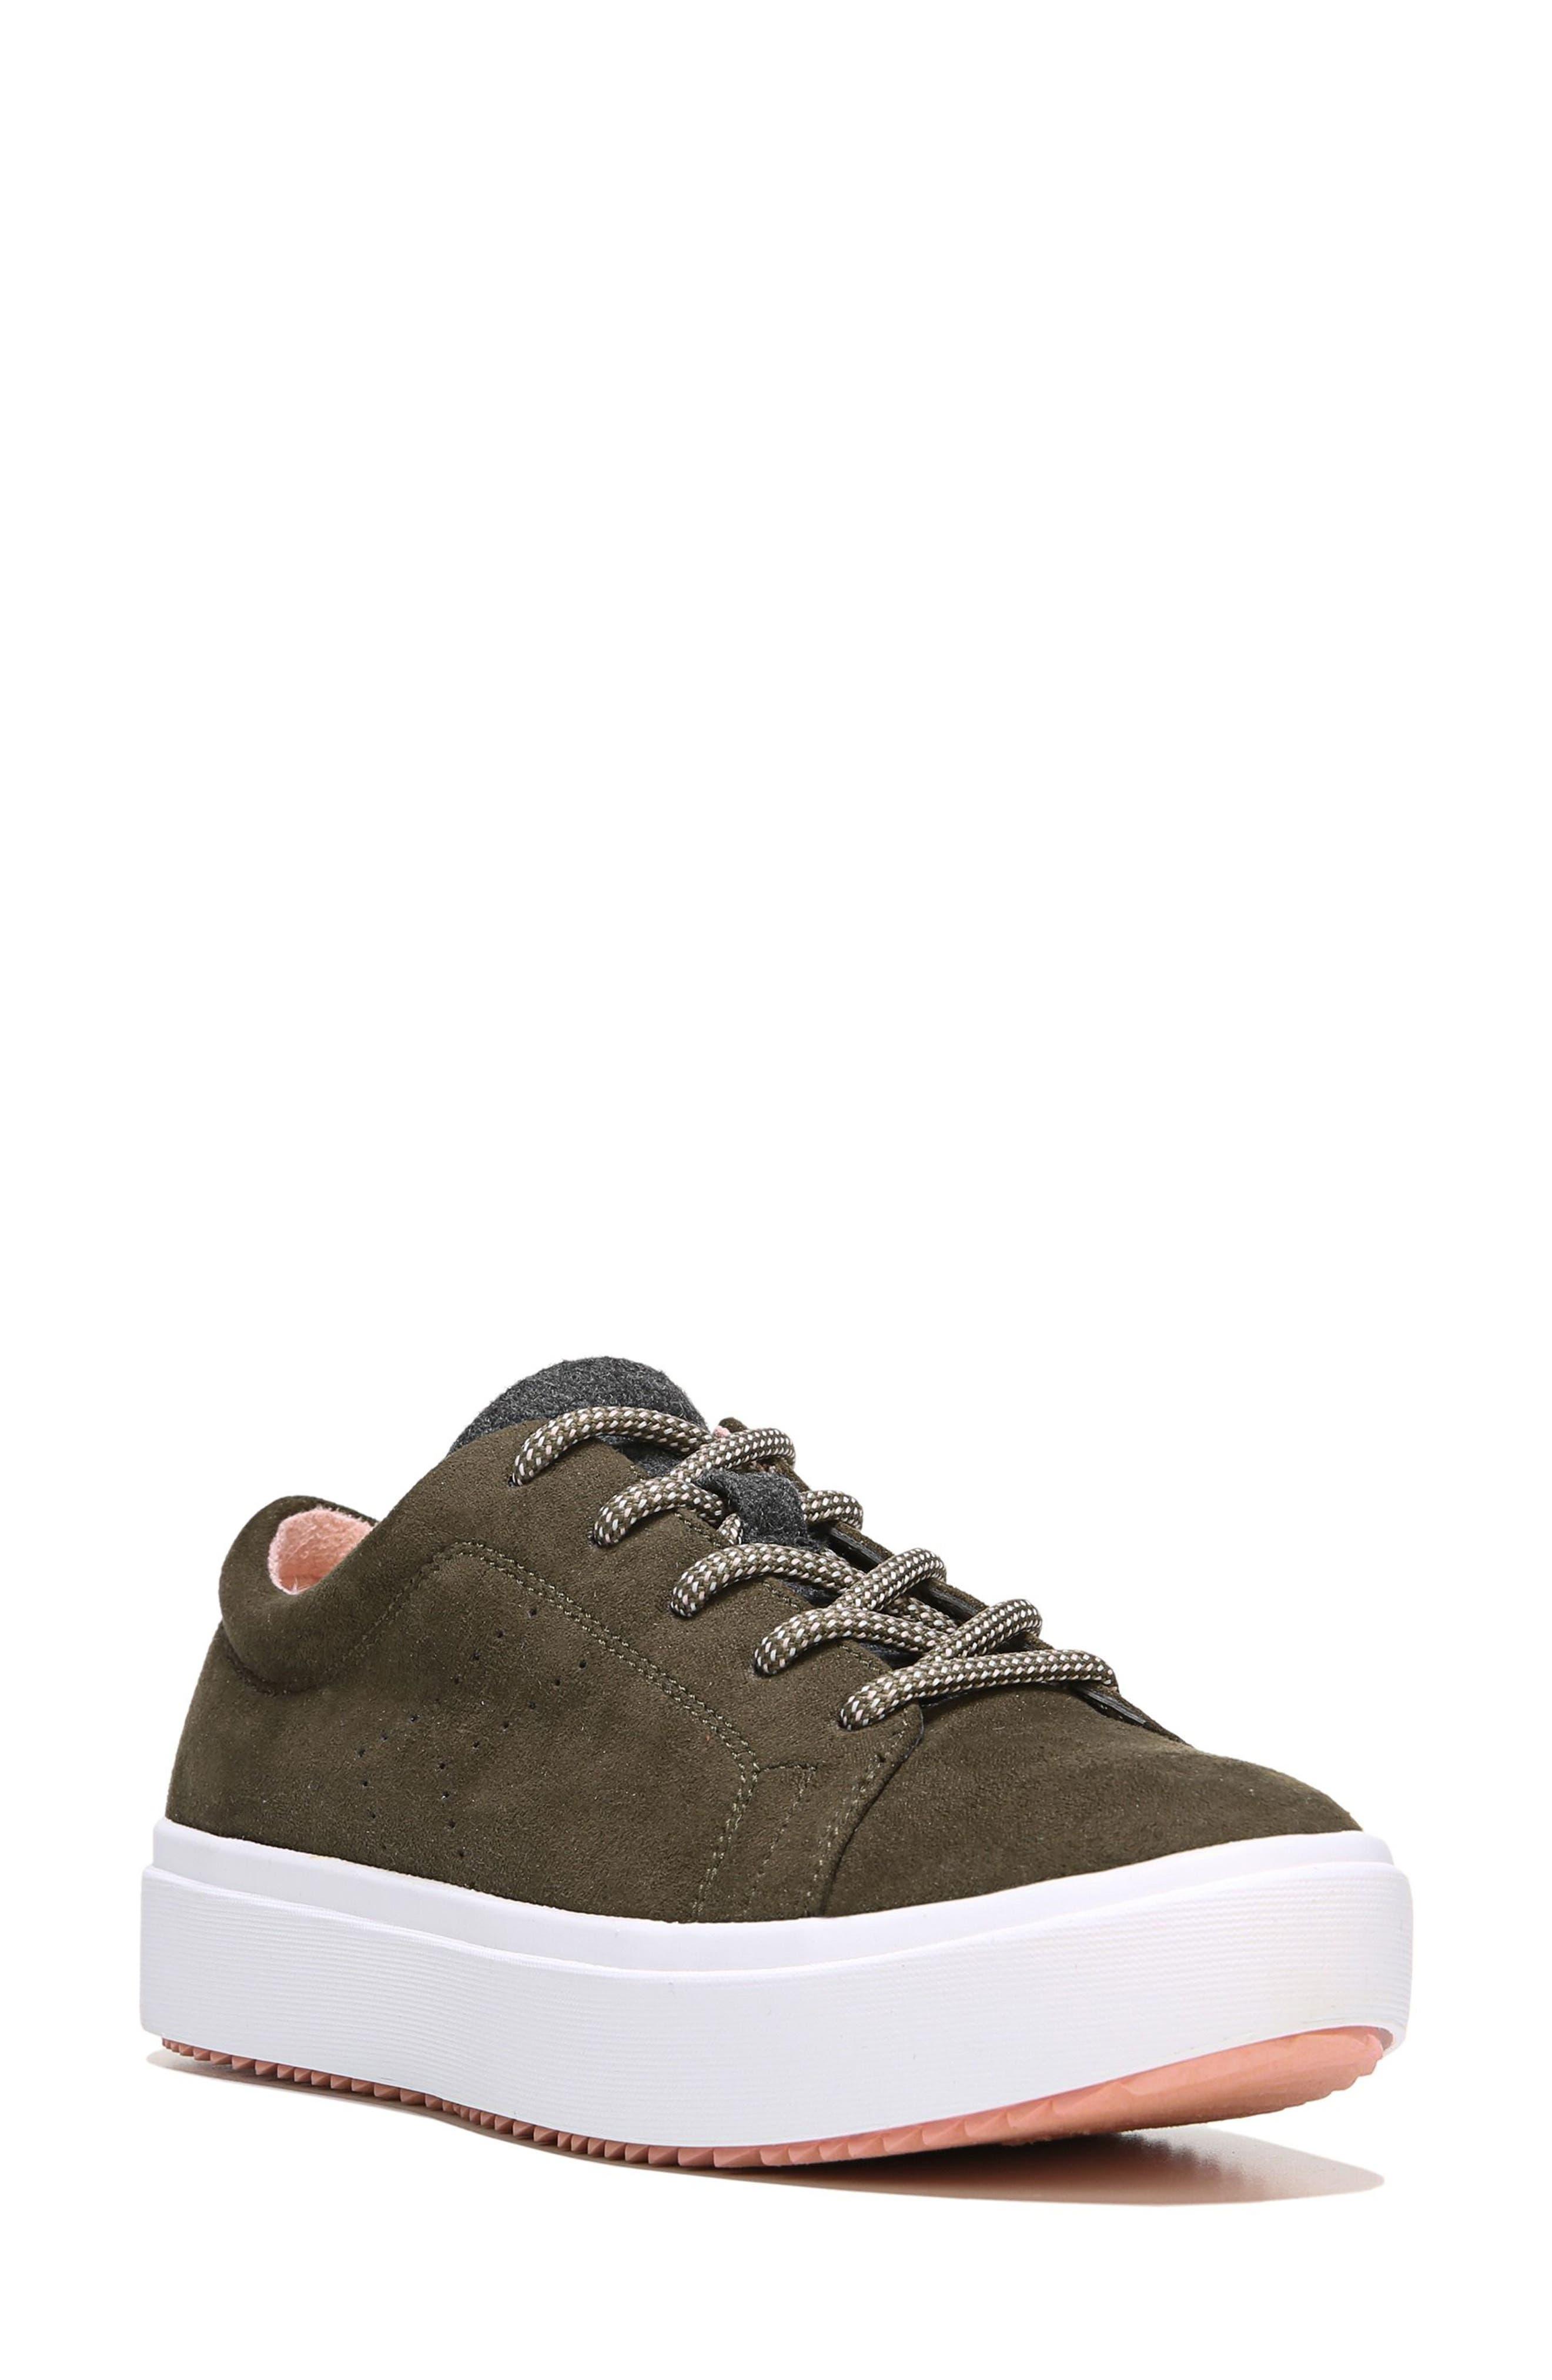 Wander Sneaker,                             Main thumbnail 1, color,                             020